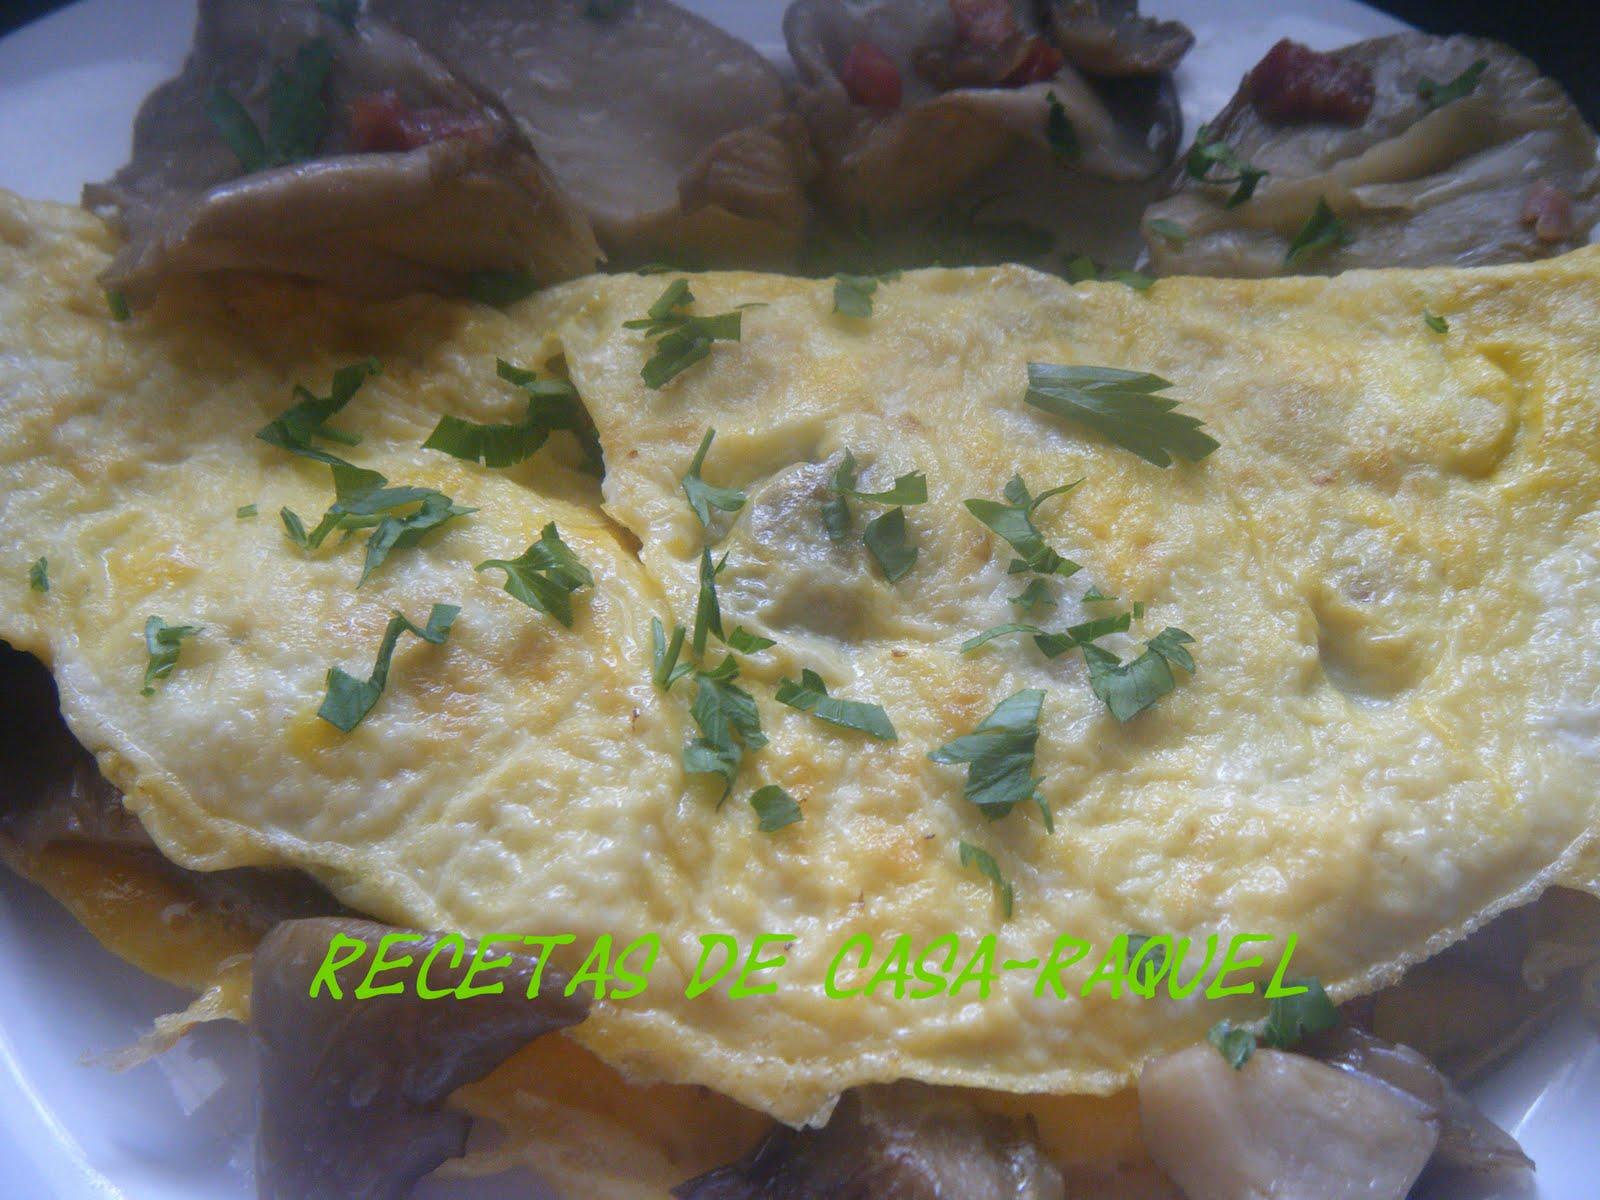 Tortilla con setas recetas que nunca fallan for Como se cocinan las setas